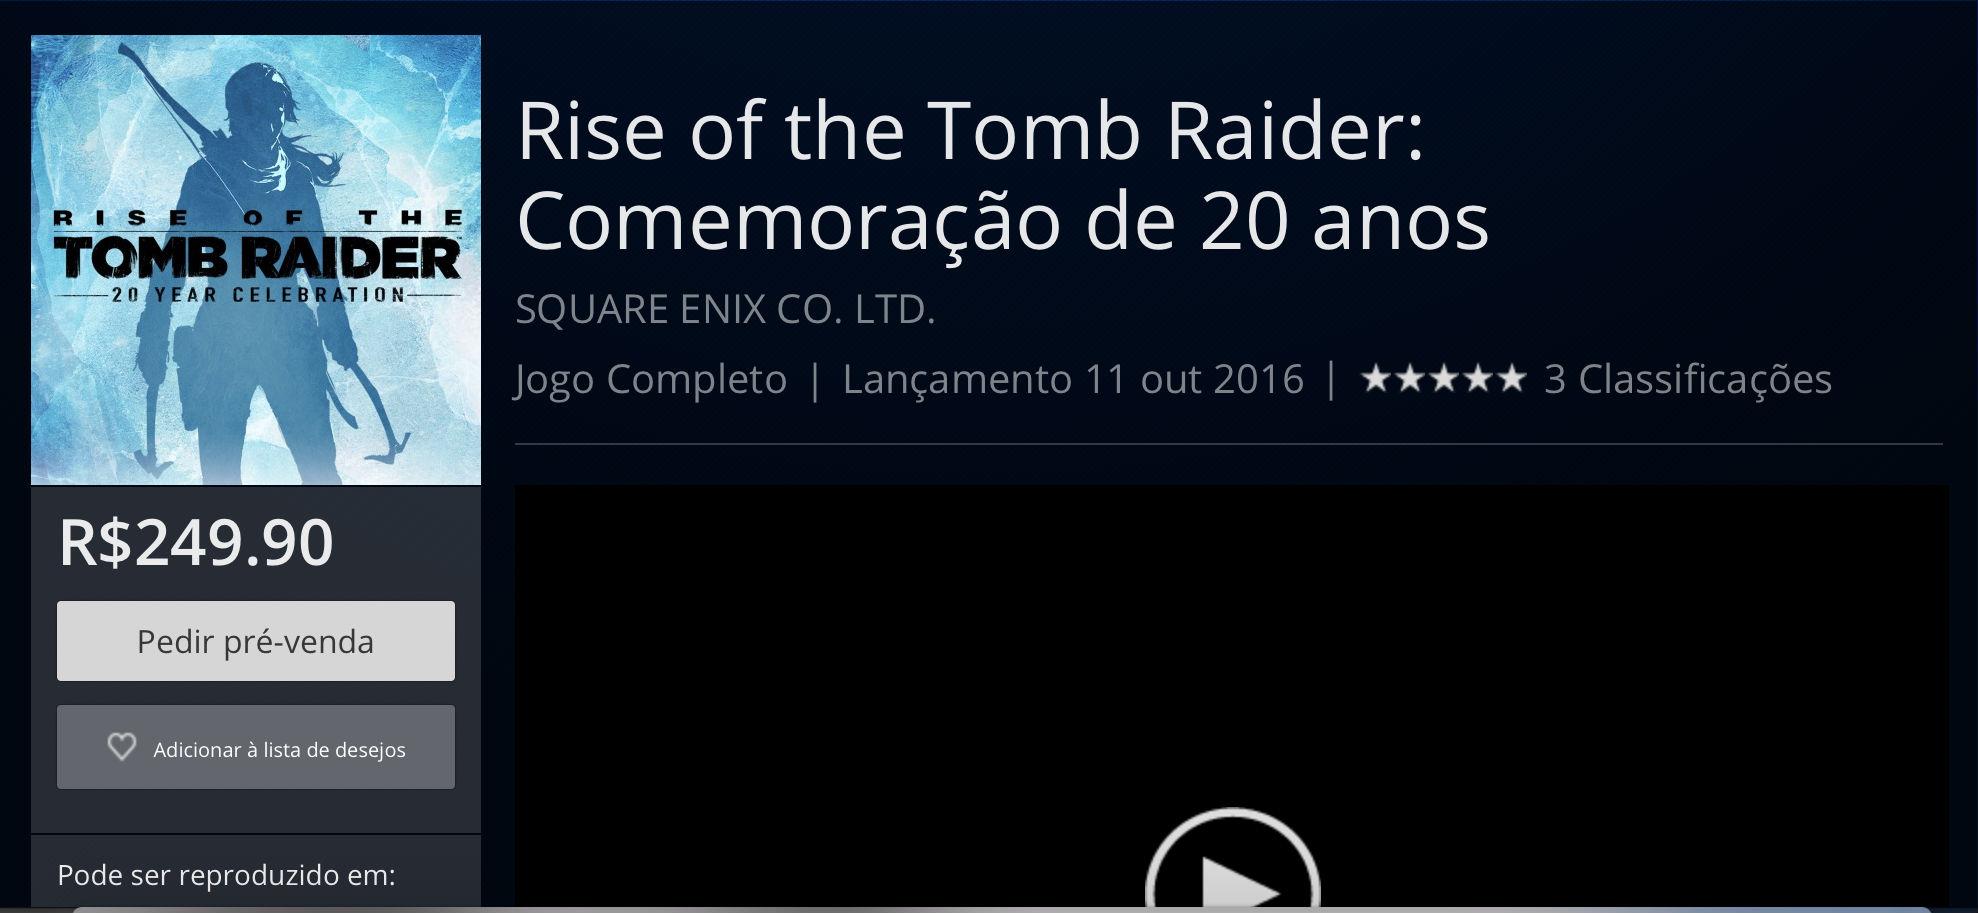 Rise of the Tomb Raider_pré-venda